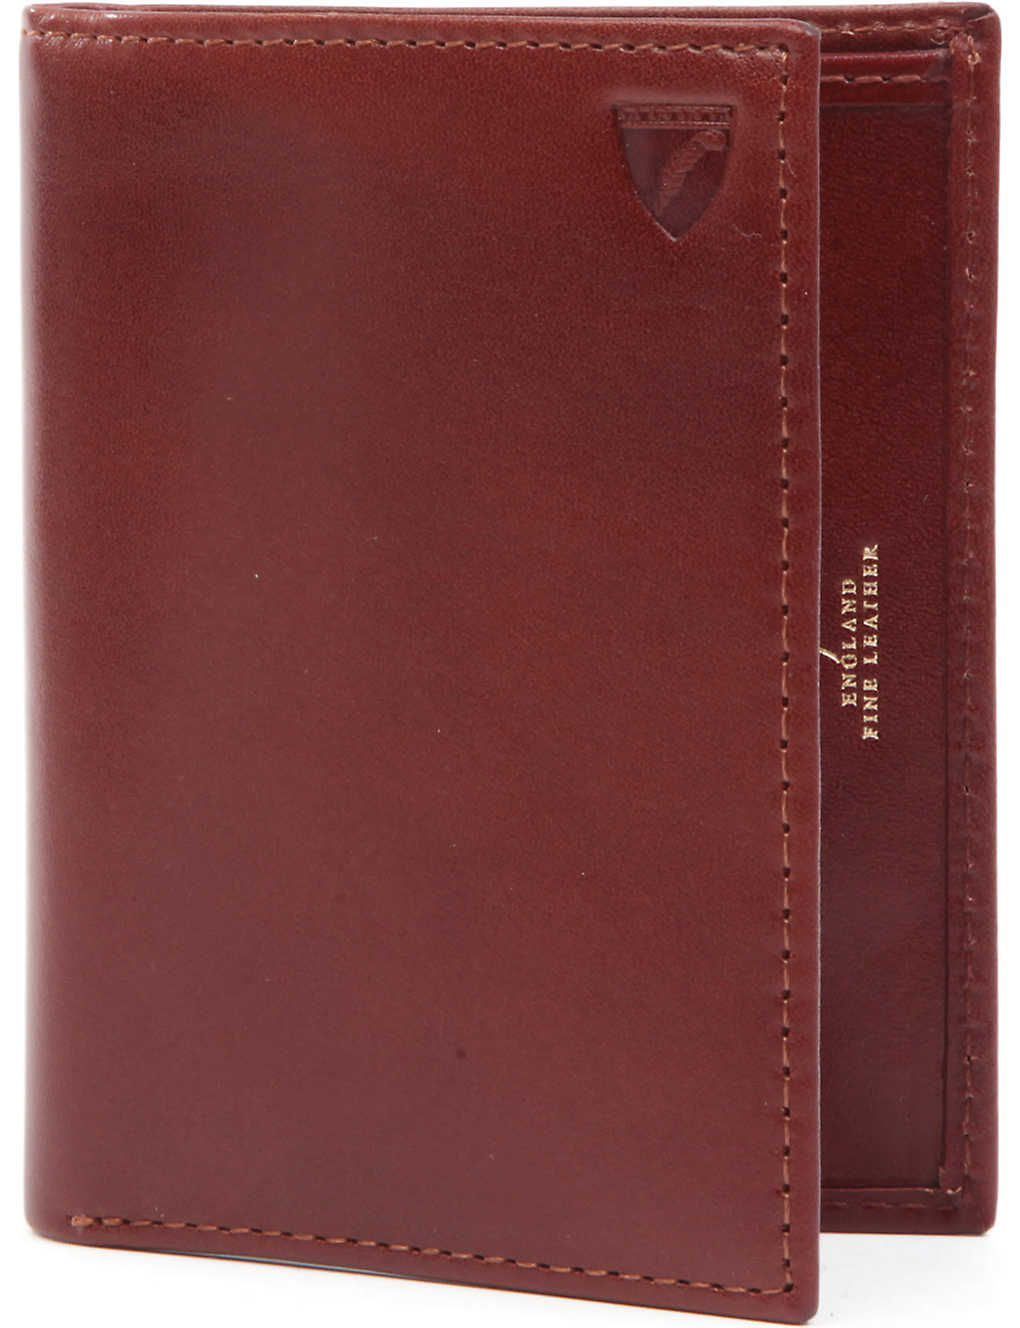 the latest 82d37 de58d Double-fold leather card holder